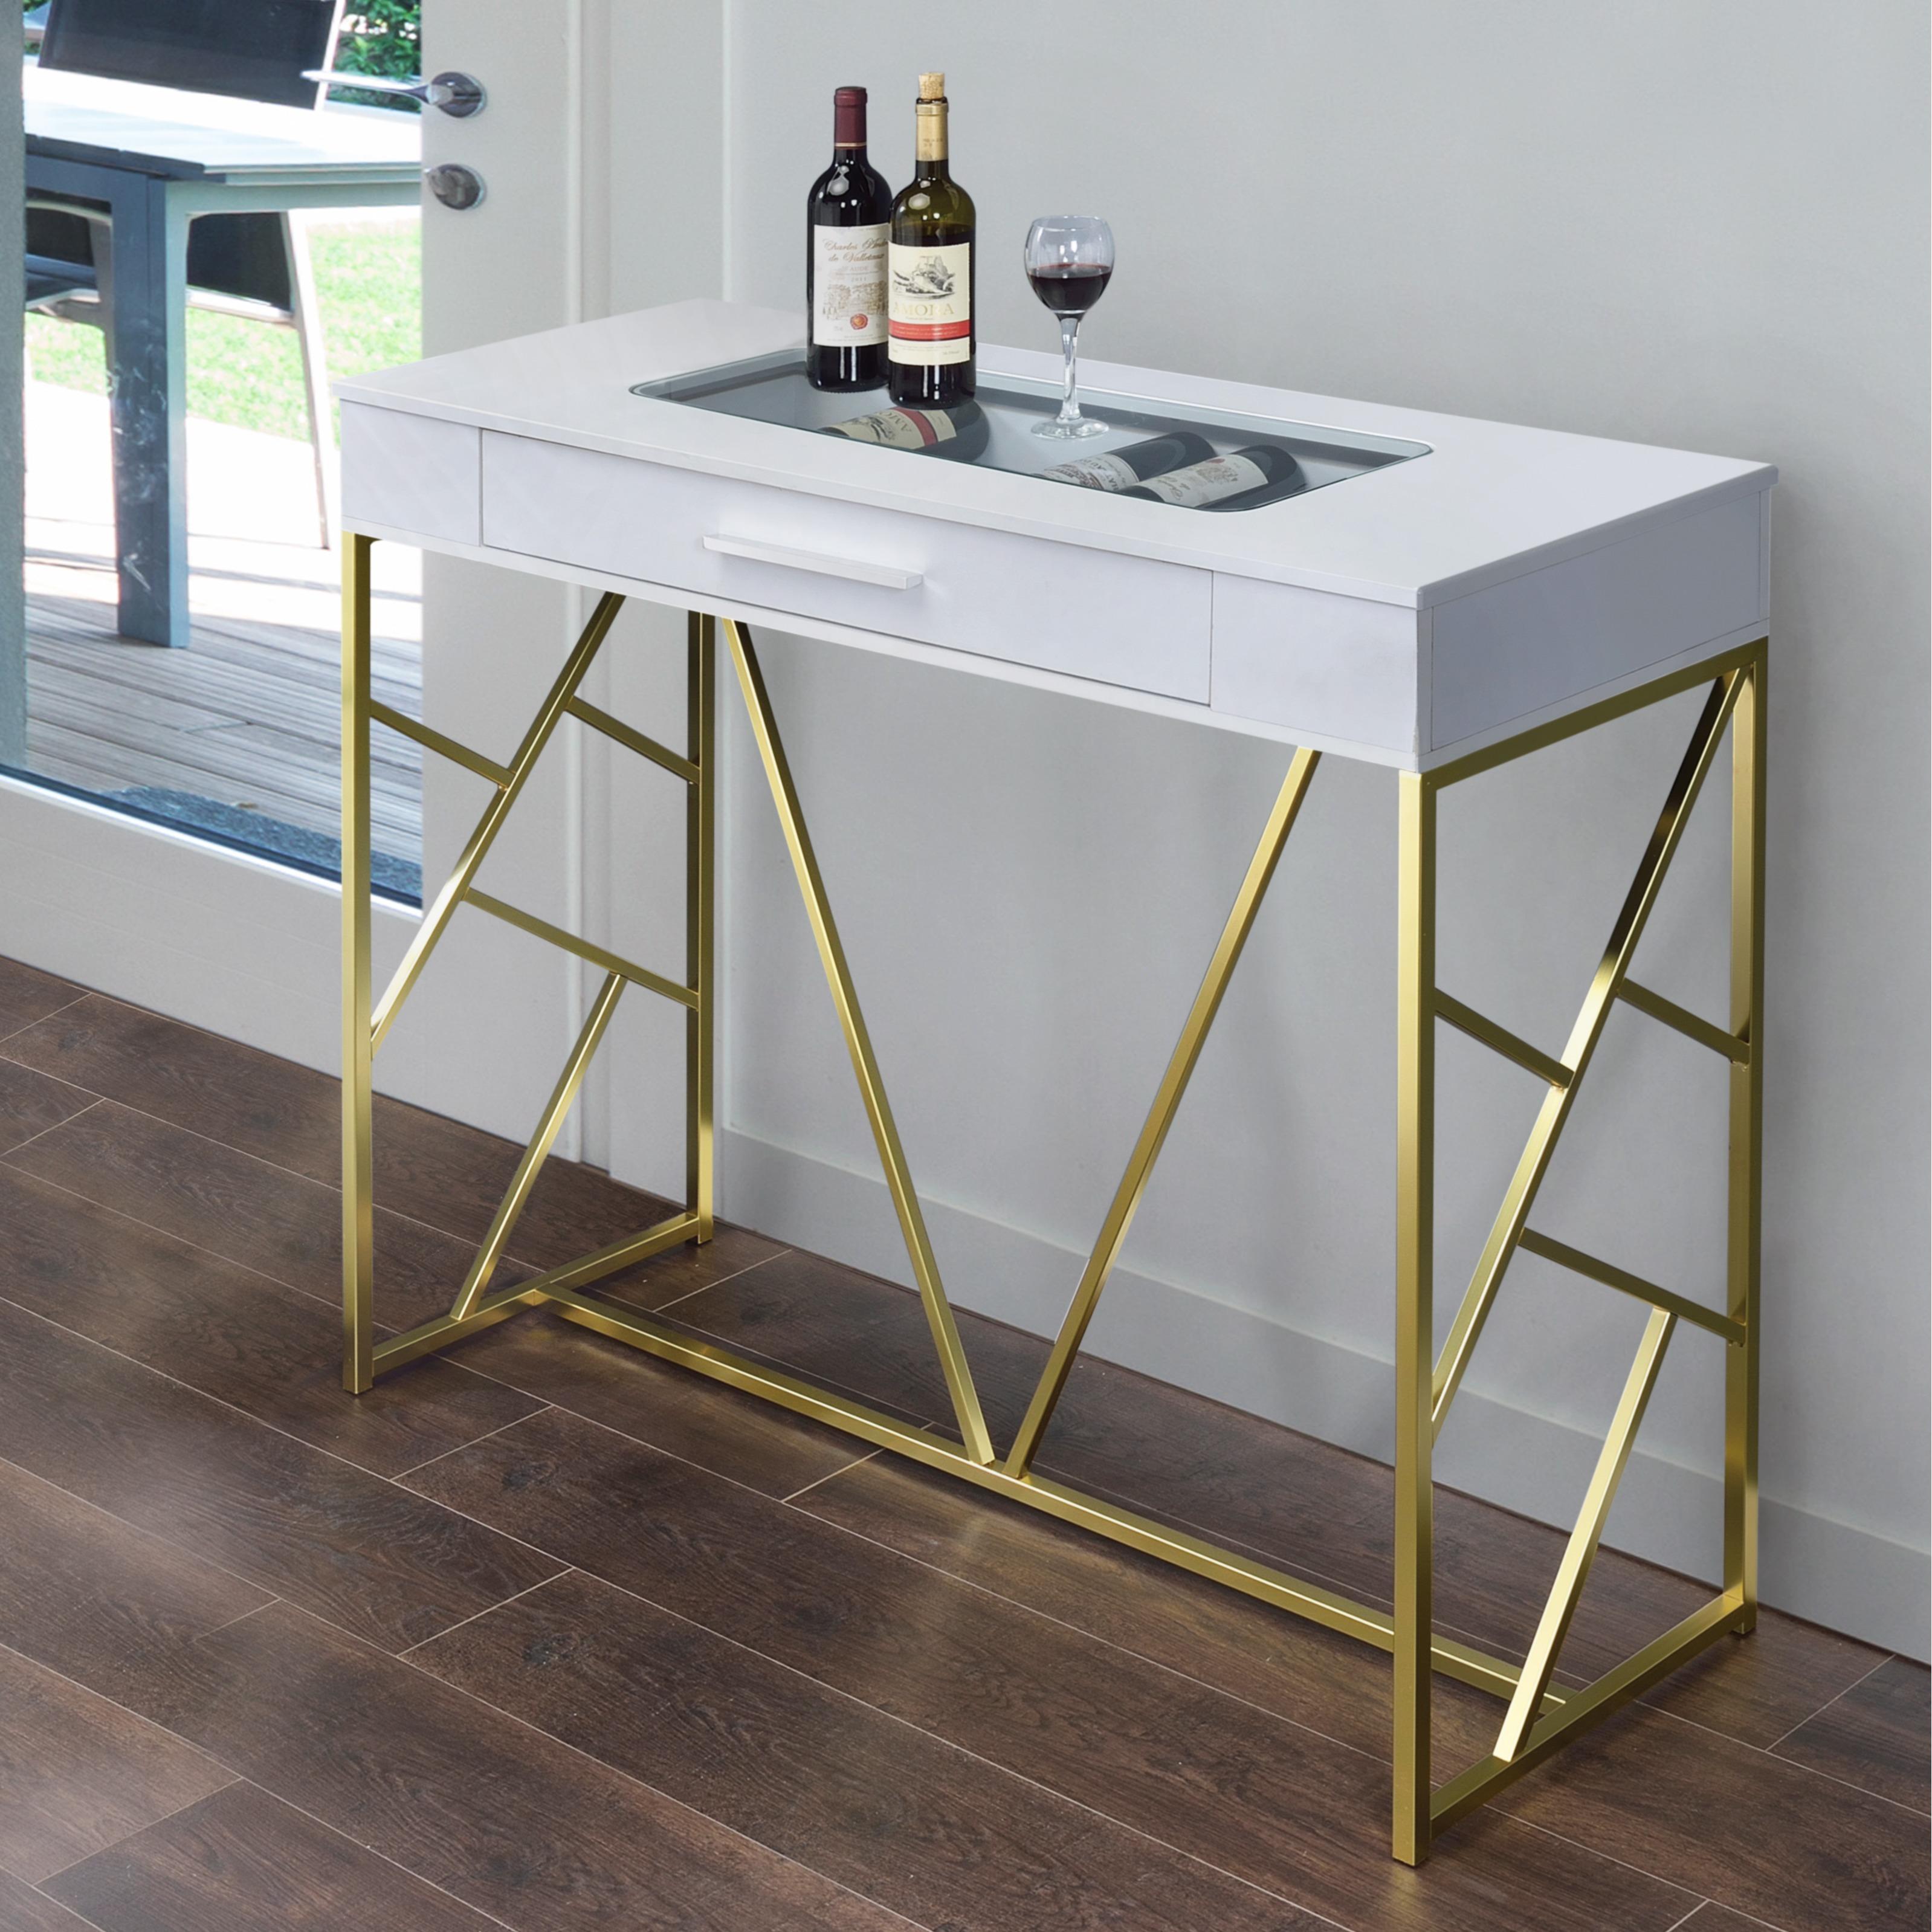 Furniture of America Kisten Contemporary 1-drawer Bar Hei...